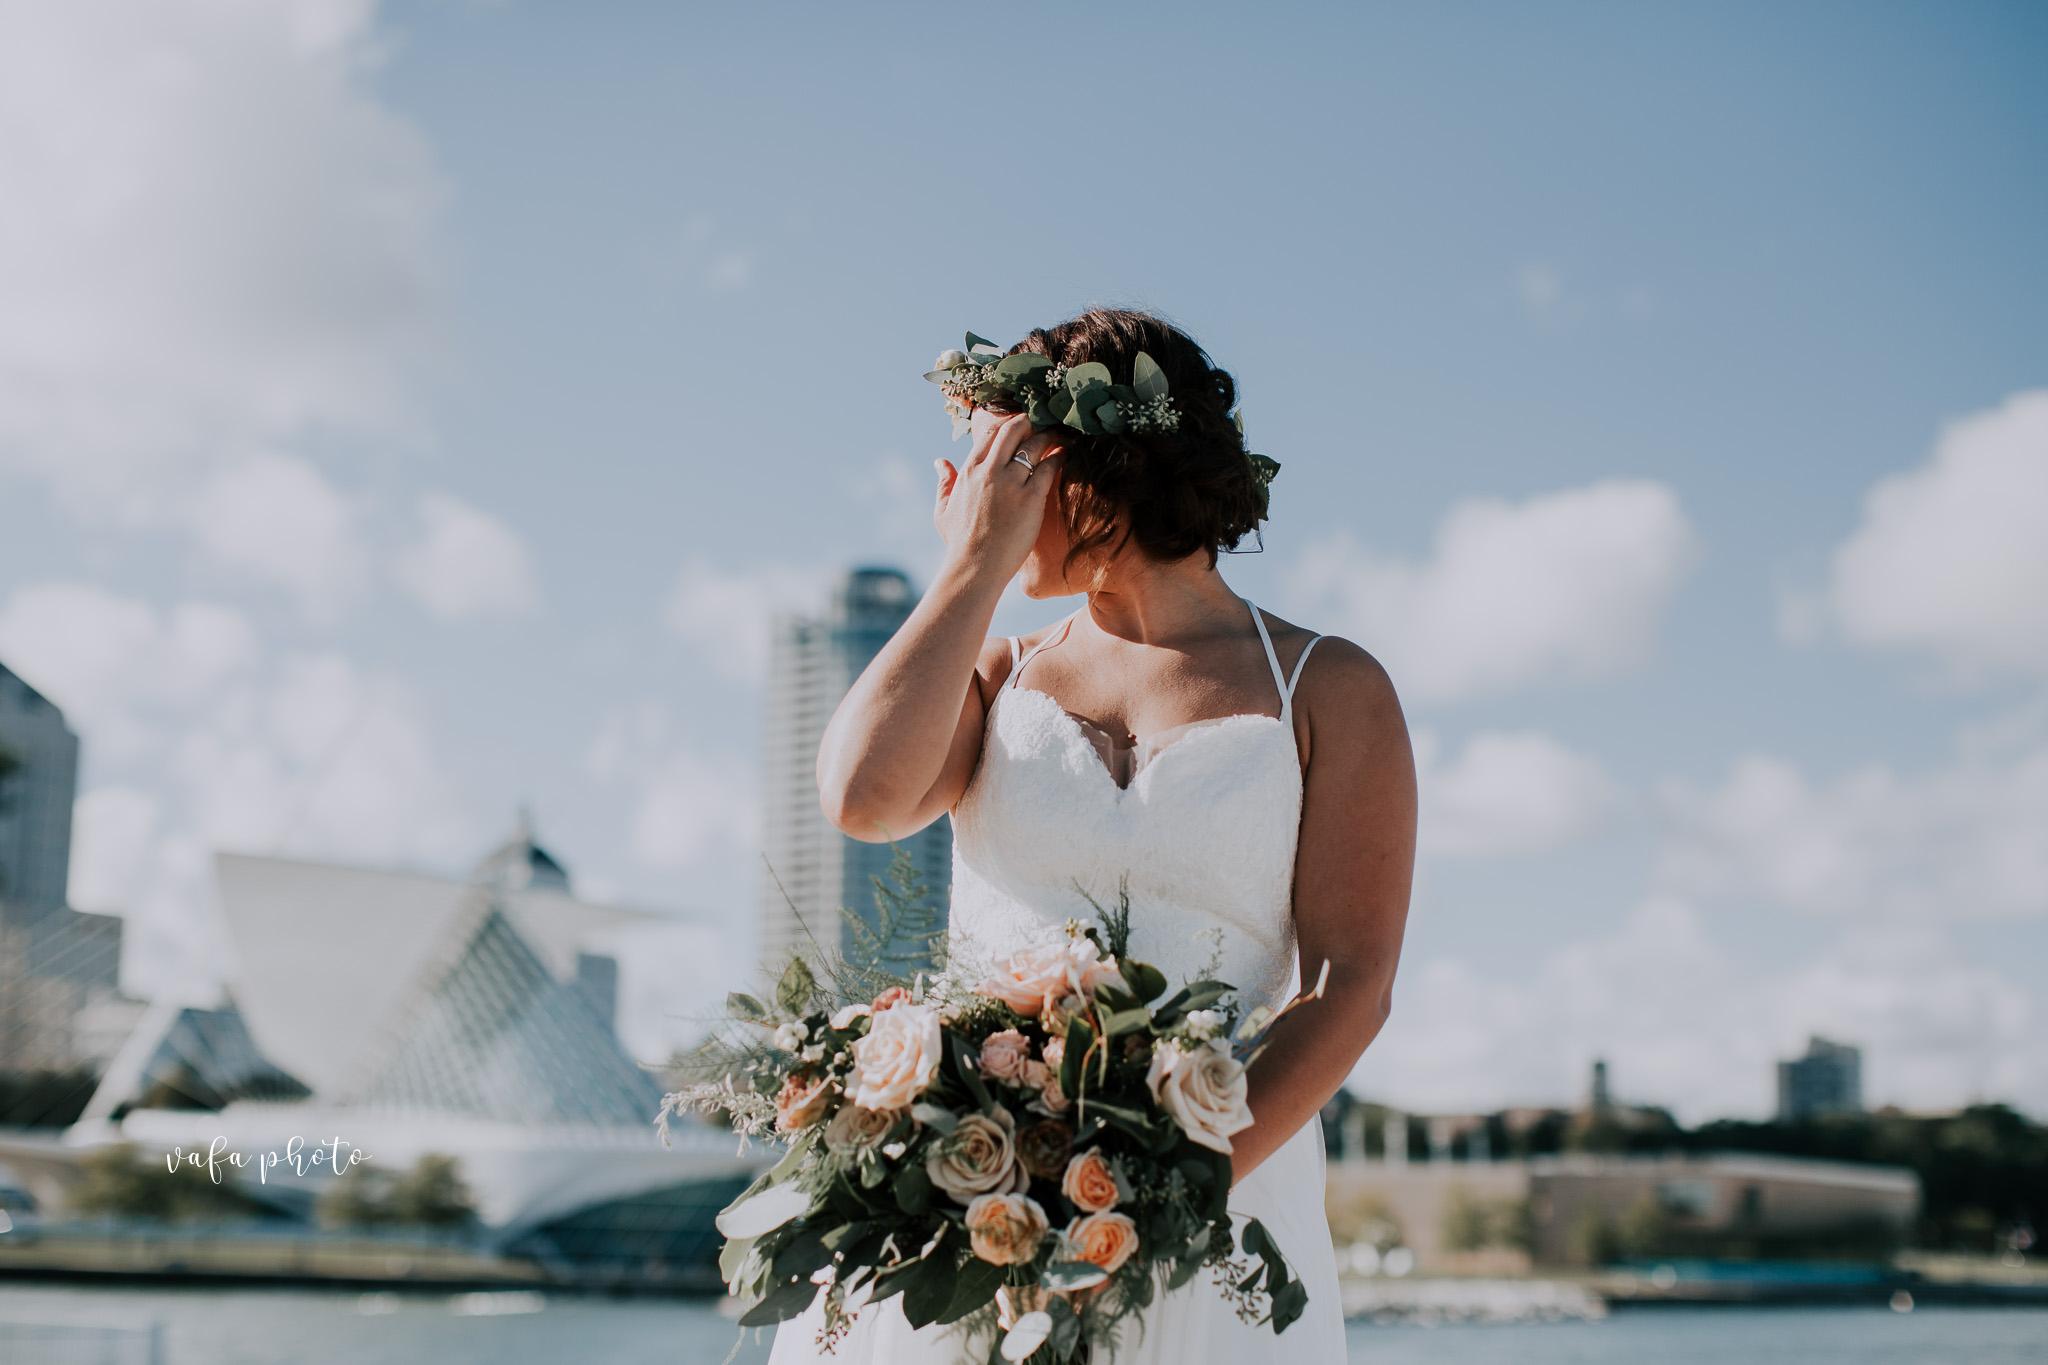 Milwaukee-Athletic-Club-Wedding-Amanda-Tony-Vafa-Photo-627.jpg